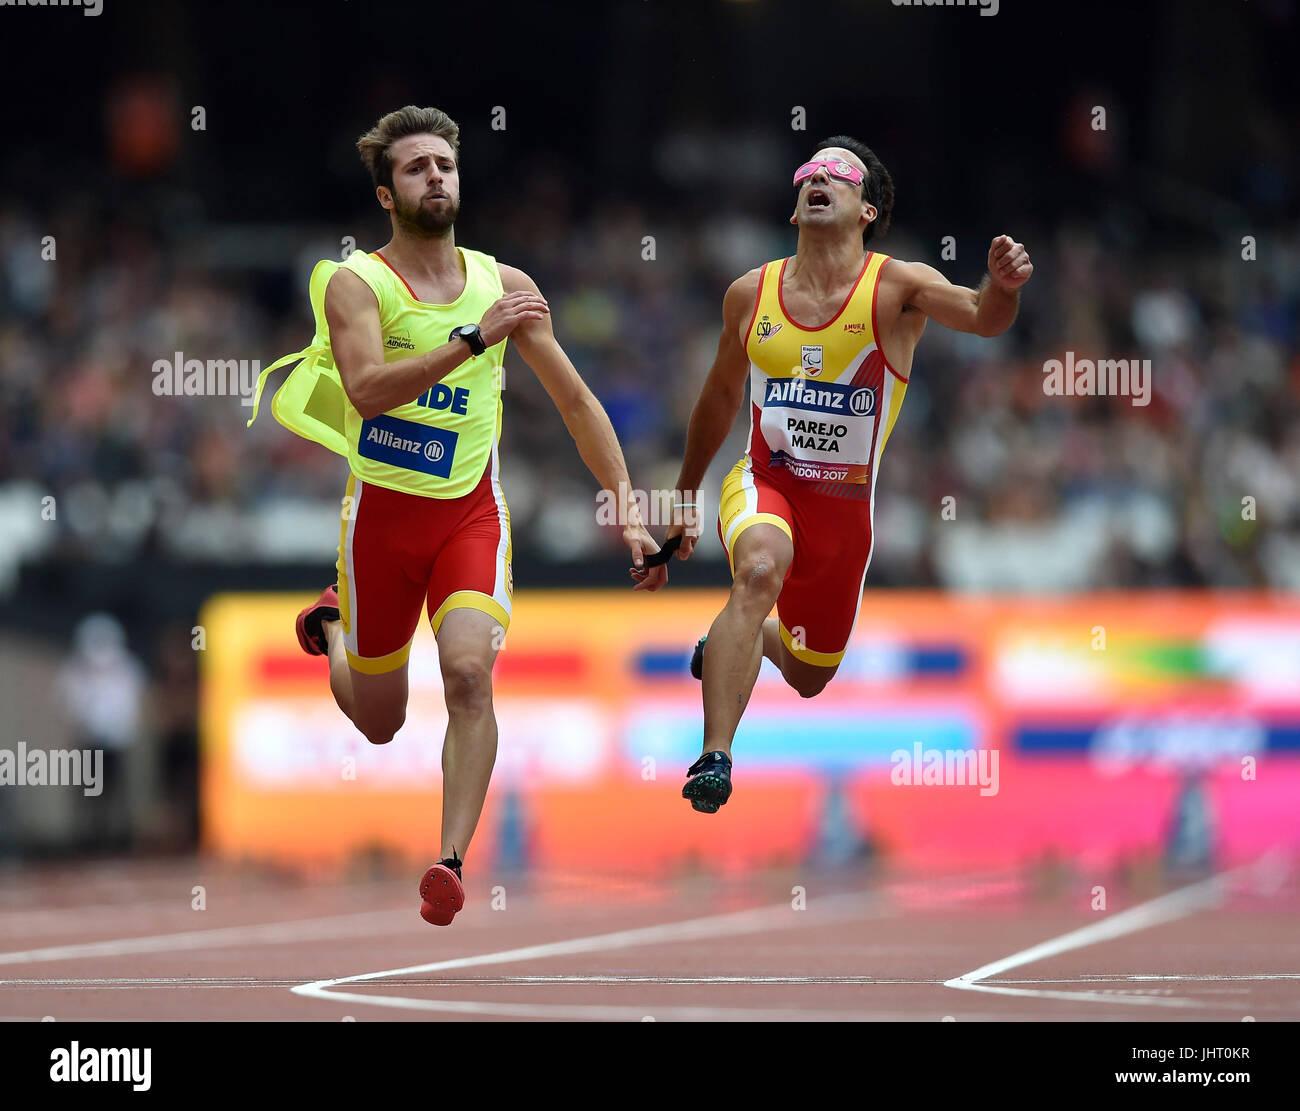 London, UK. 15. Juli 2017.  Während Männer 100 M T11, R1, H2/3 an der Welt Para Athletik, WM London 2017 Stockbild